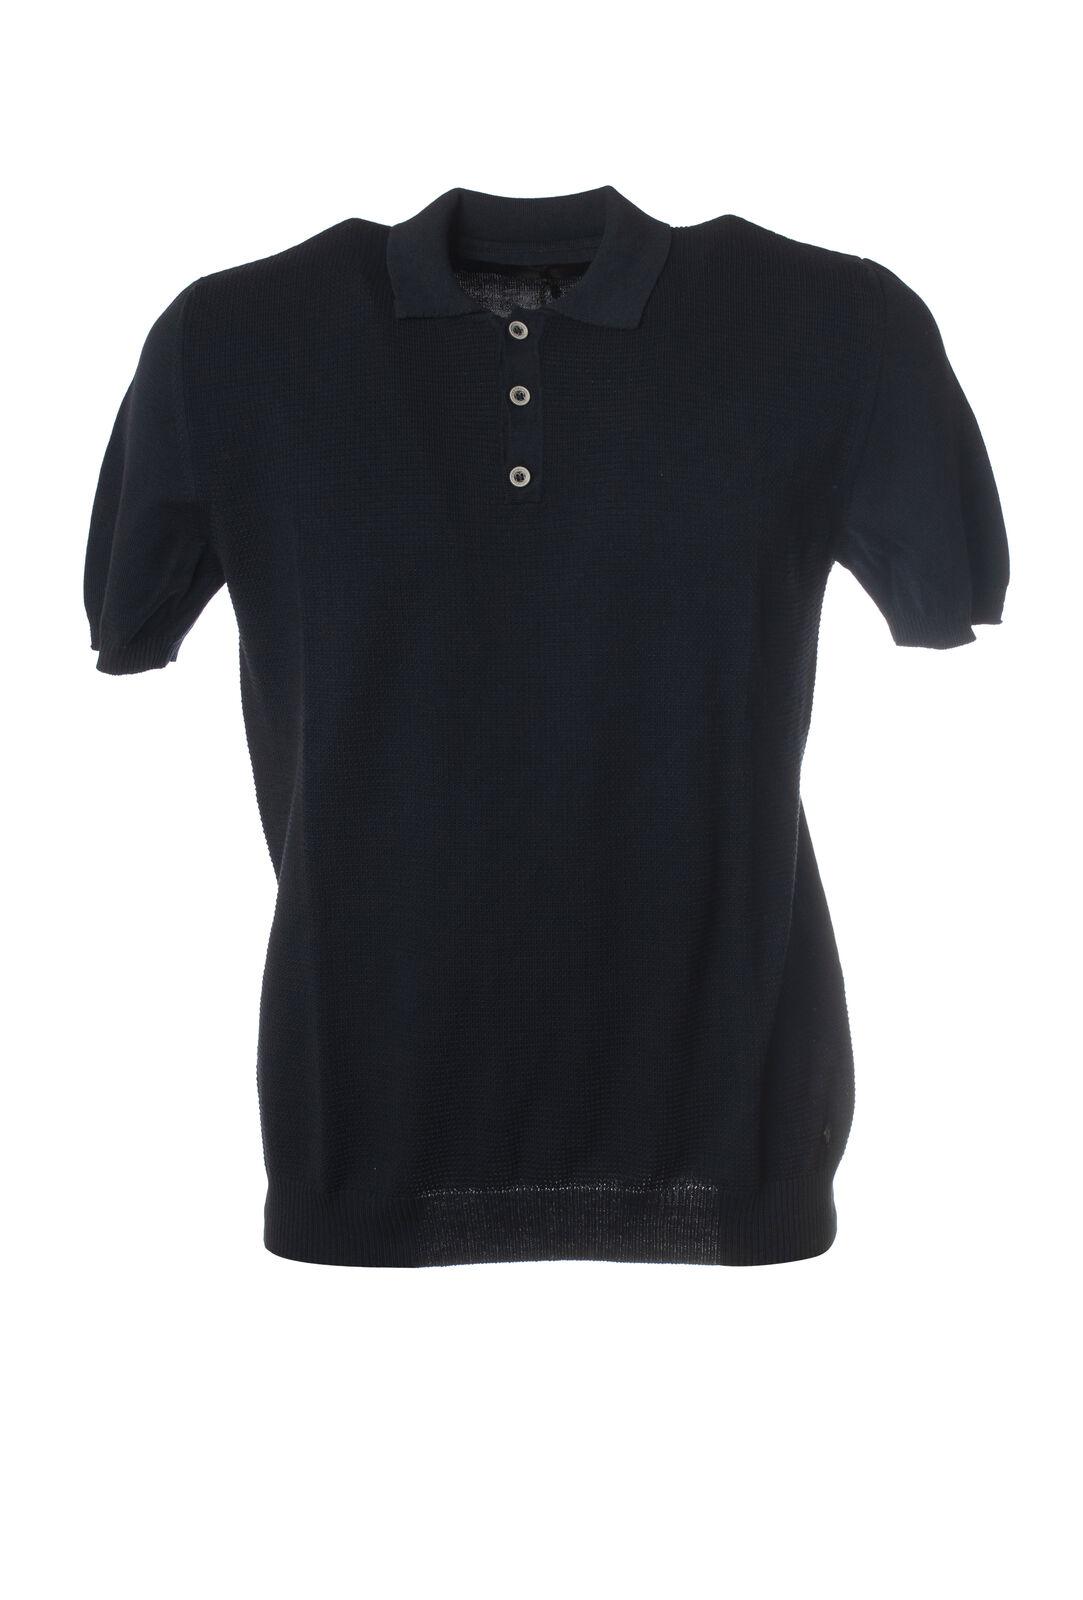 c34c1c61 Laboratori Italiani - Topwear-Polo Man - bluee - 6094921C191708 -  nockst14830-T-Shirts